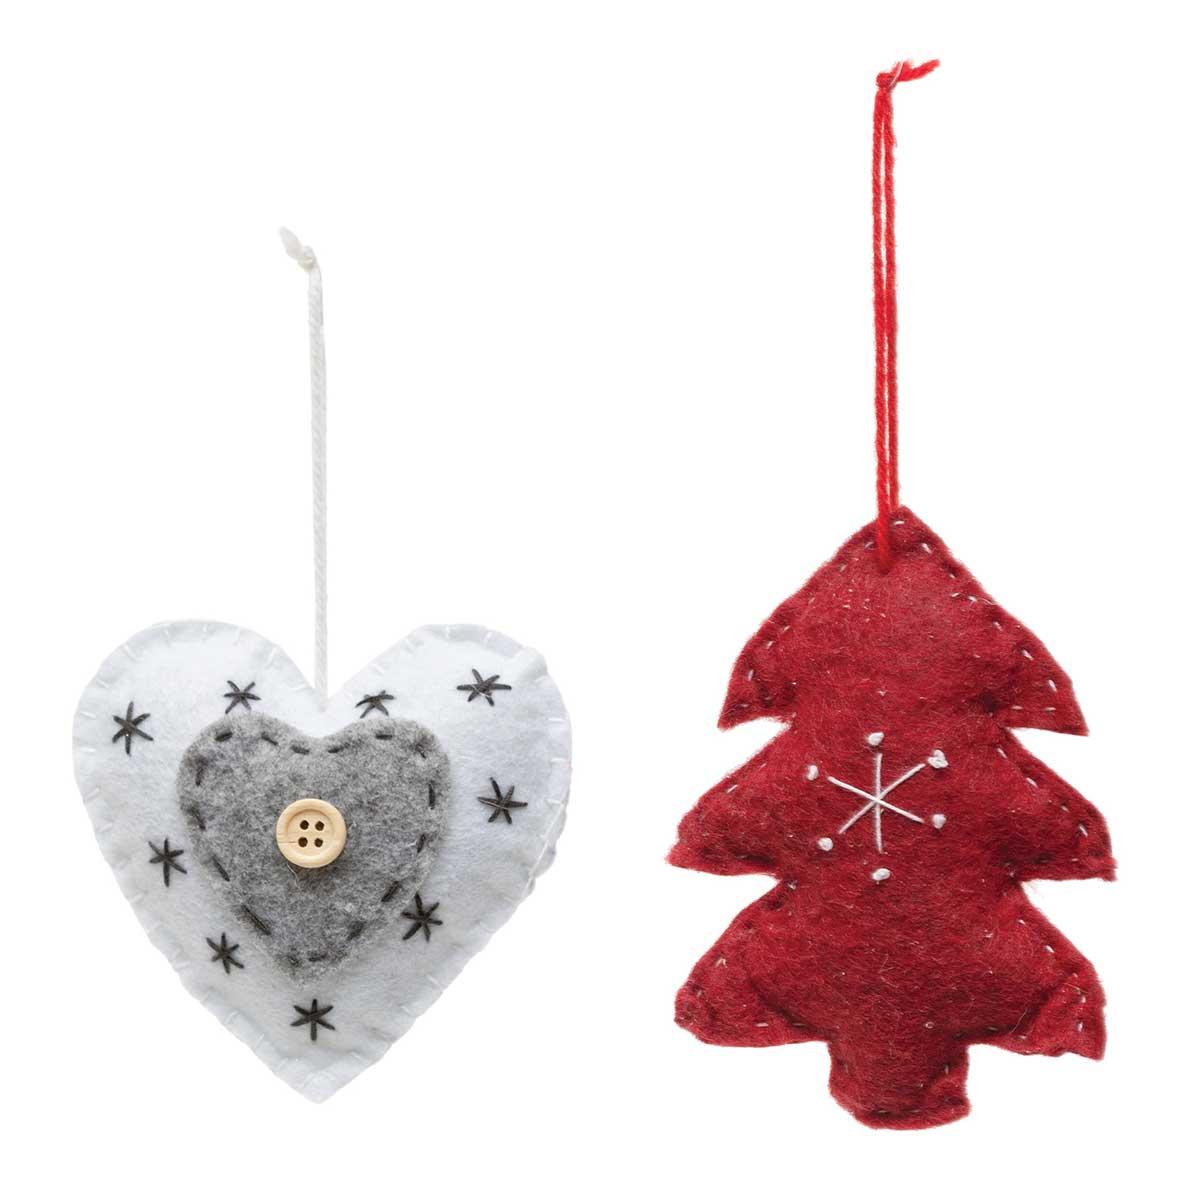 HEART & TREE PLUSH ORNAMENT